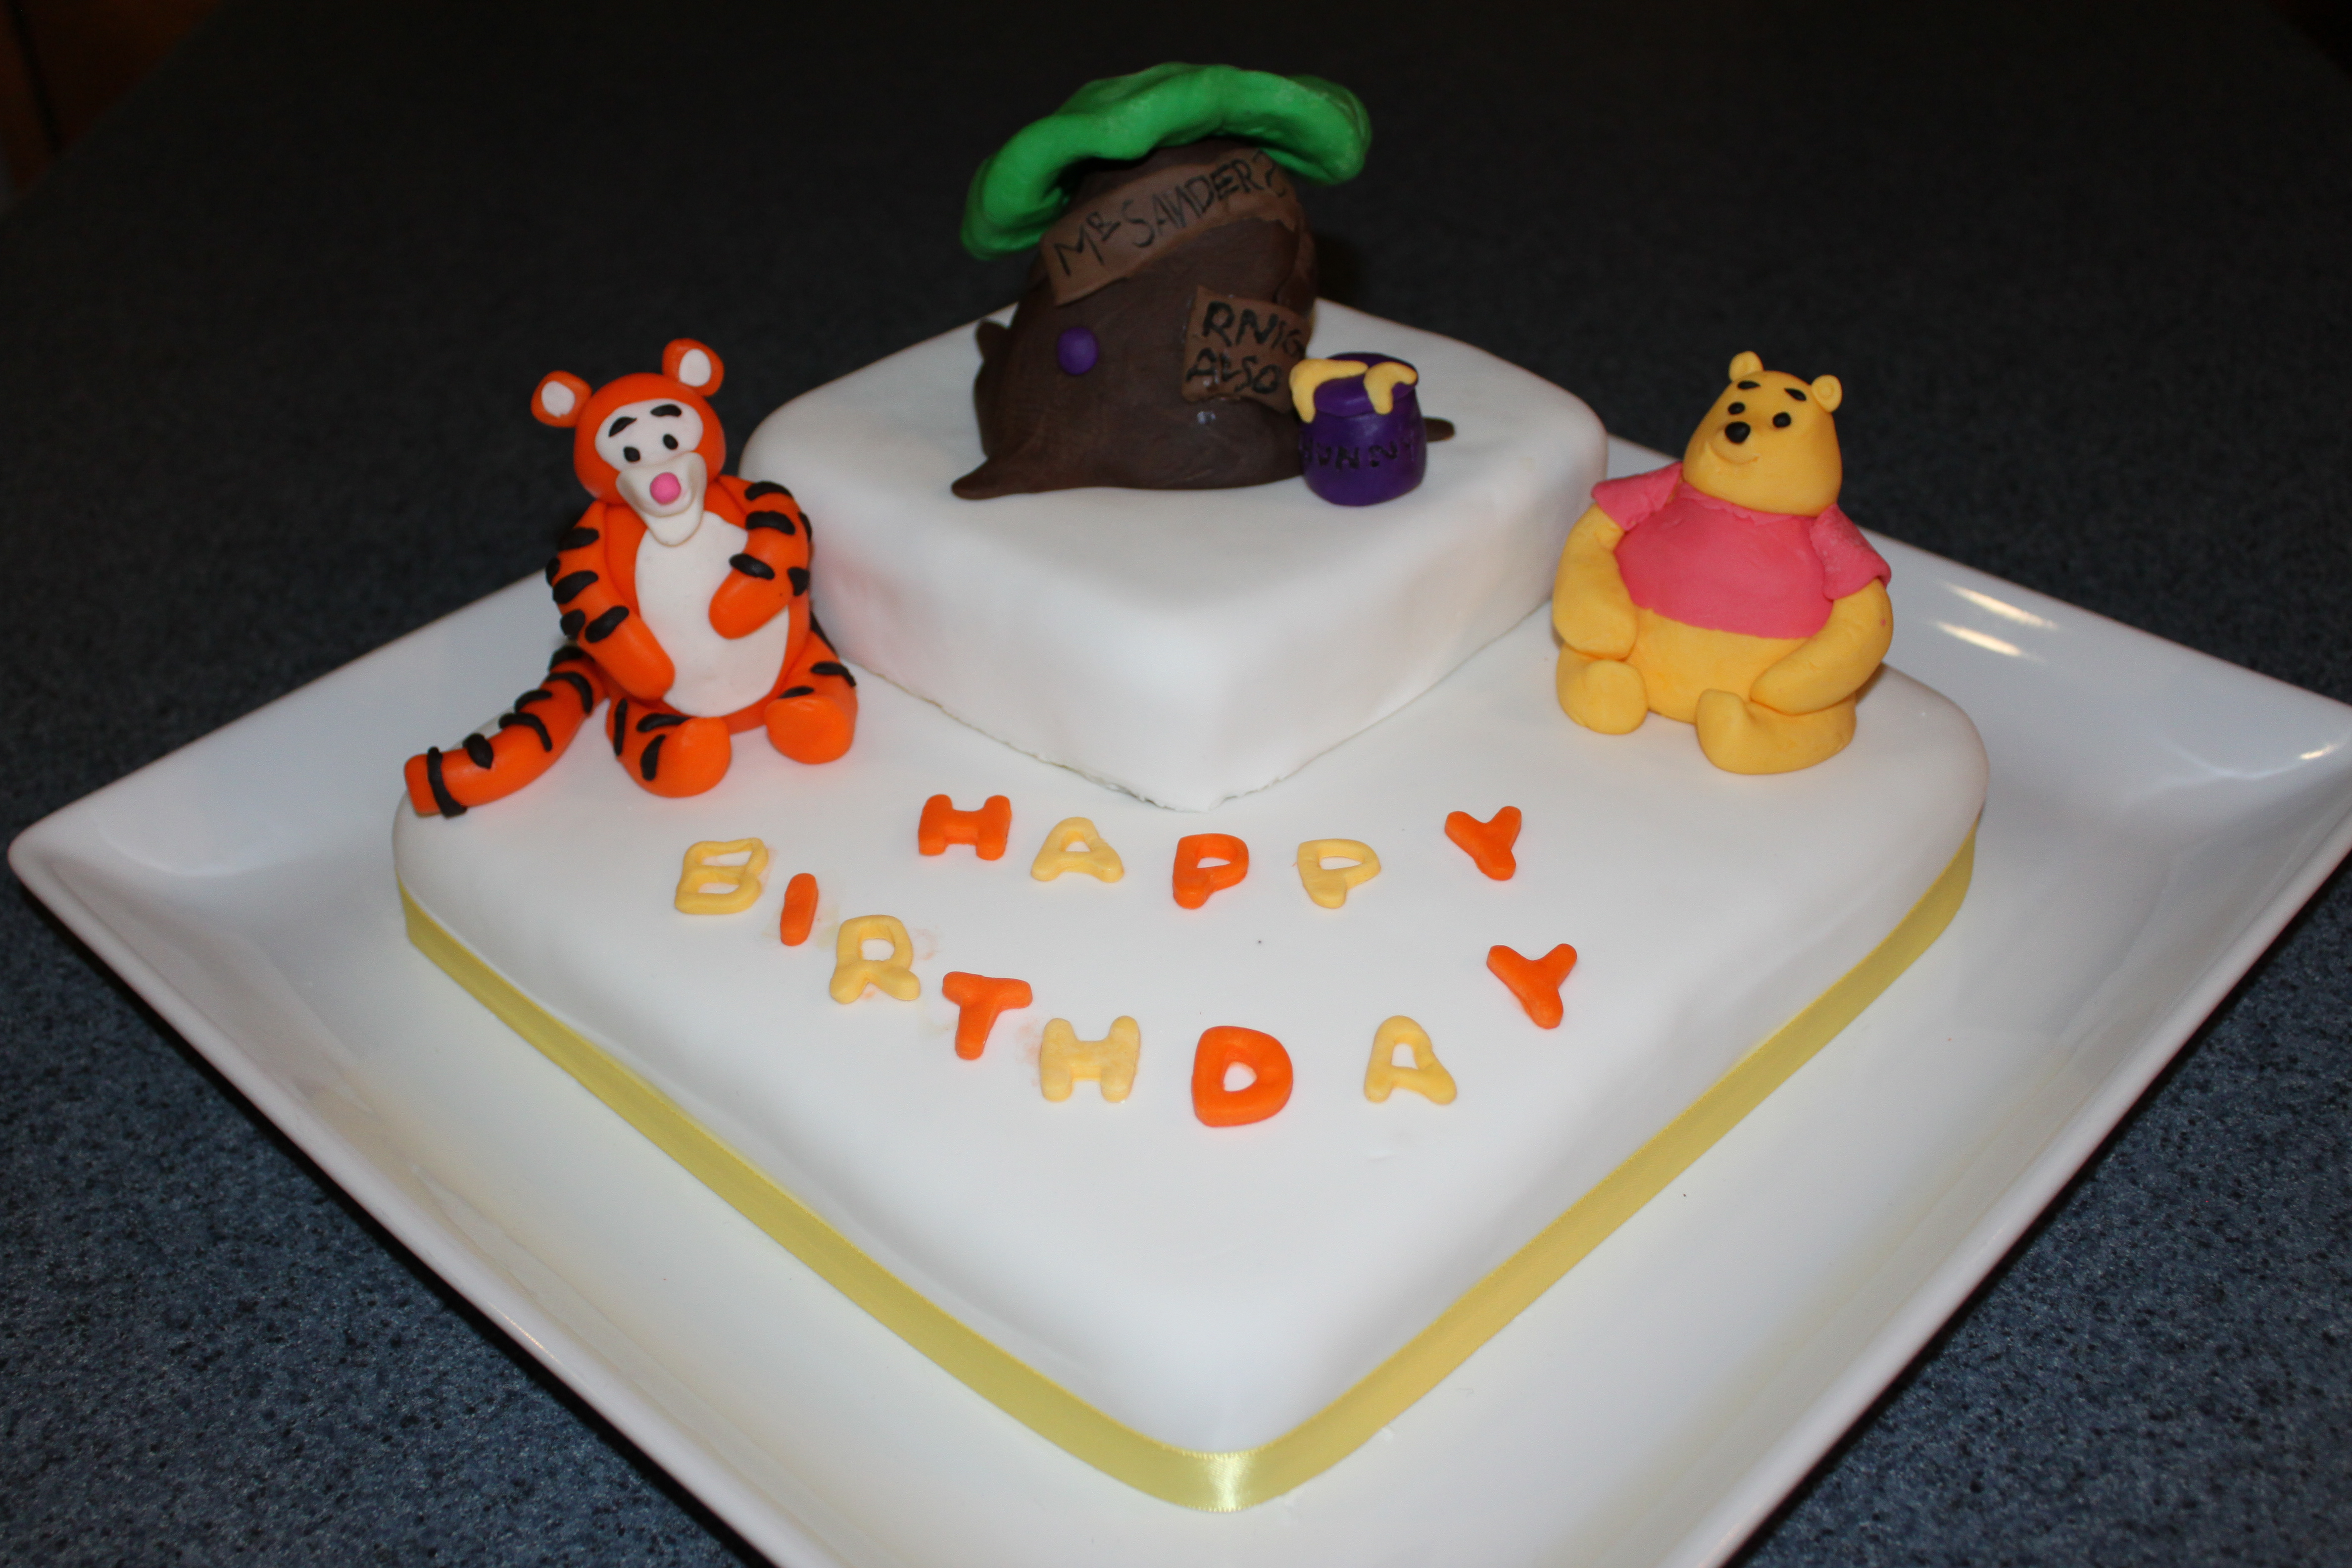 Superb Winnie The Pooh Fondant Birthday Cake Pennys Food Blog Funny Birthday Cards Online Aeocydamsfinfo